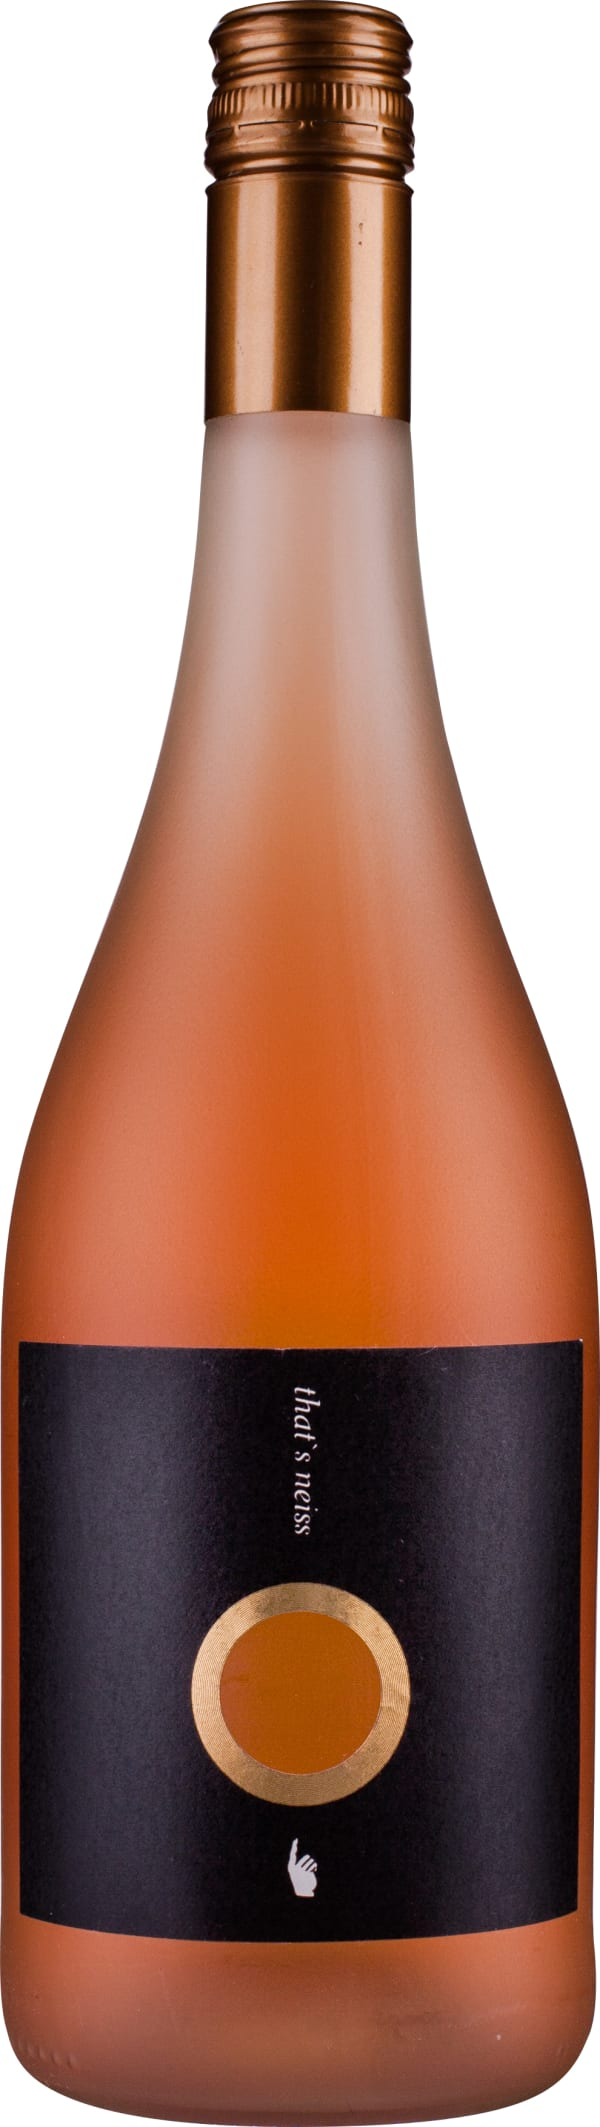 That's Neiss Pinot Noir Rosé Trocken 2019